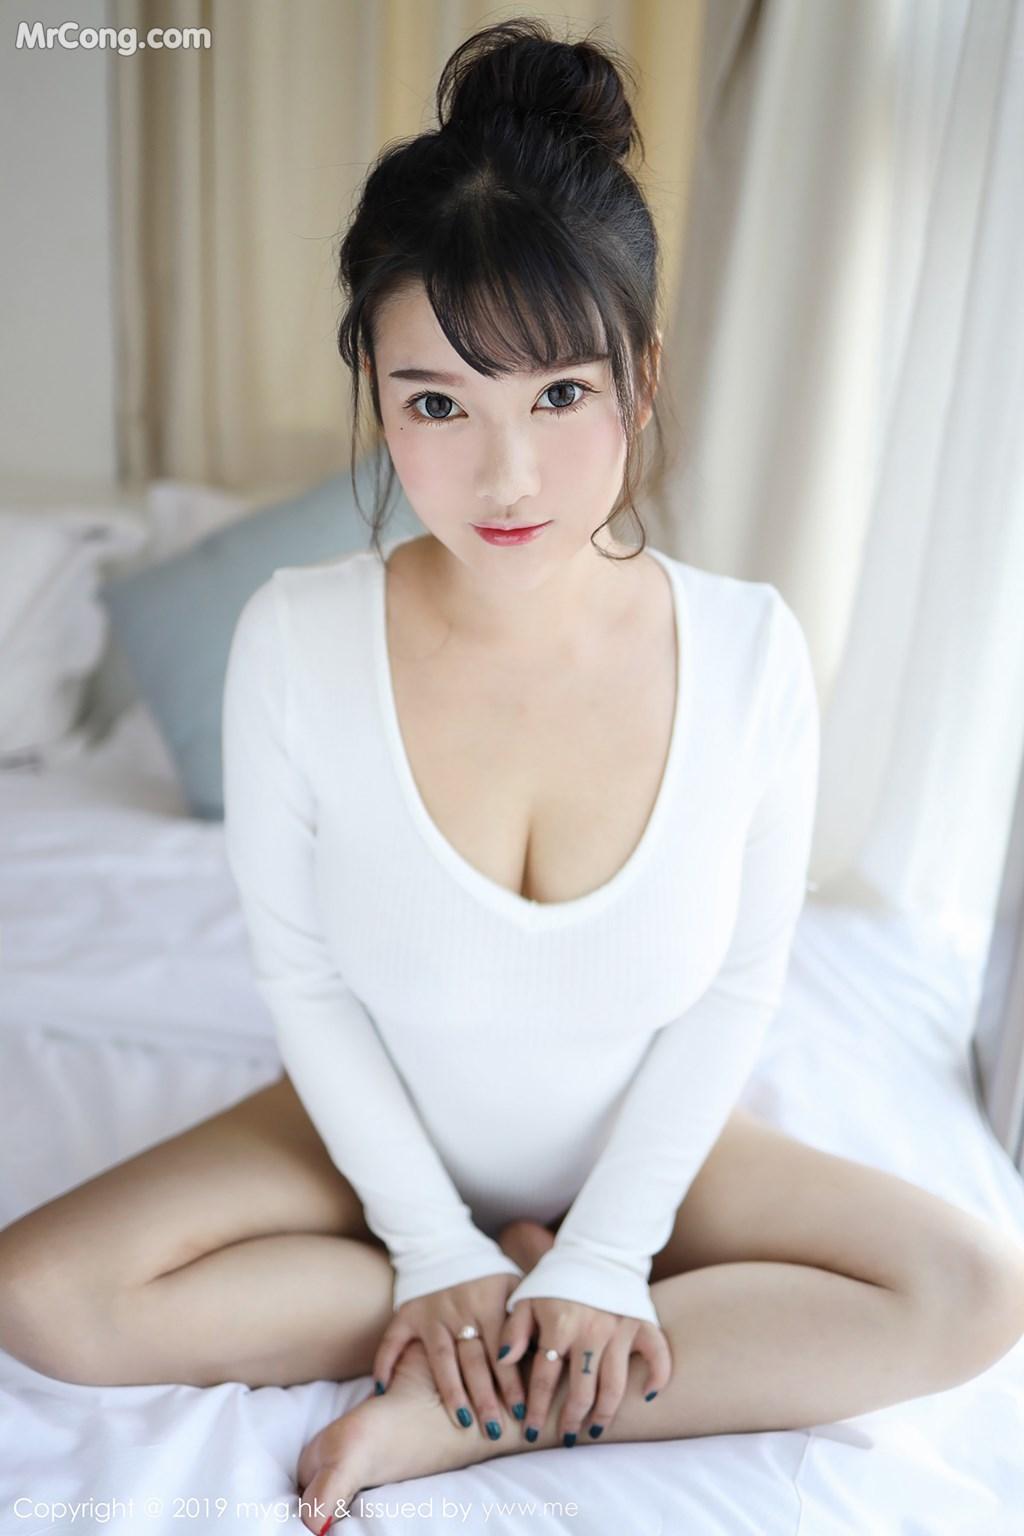 Image MyGirl-Vol.342-Xiao-You-Nai-MrCong.com-009 in post MyGirl Vol.342: Người mẫu Xiao You Nai (小尤奈) (41 ảnh)